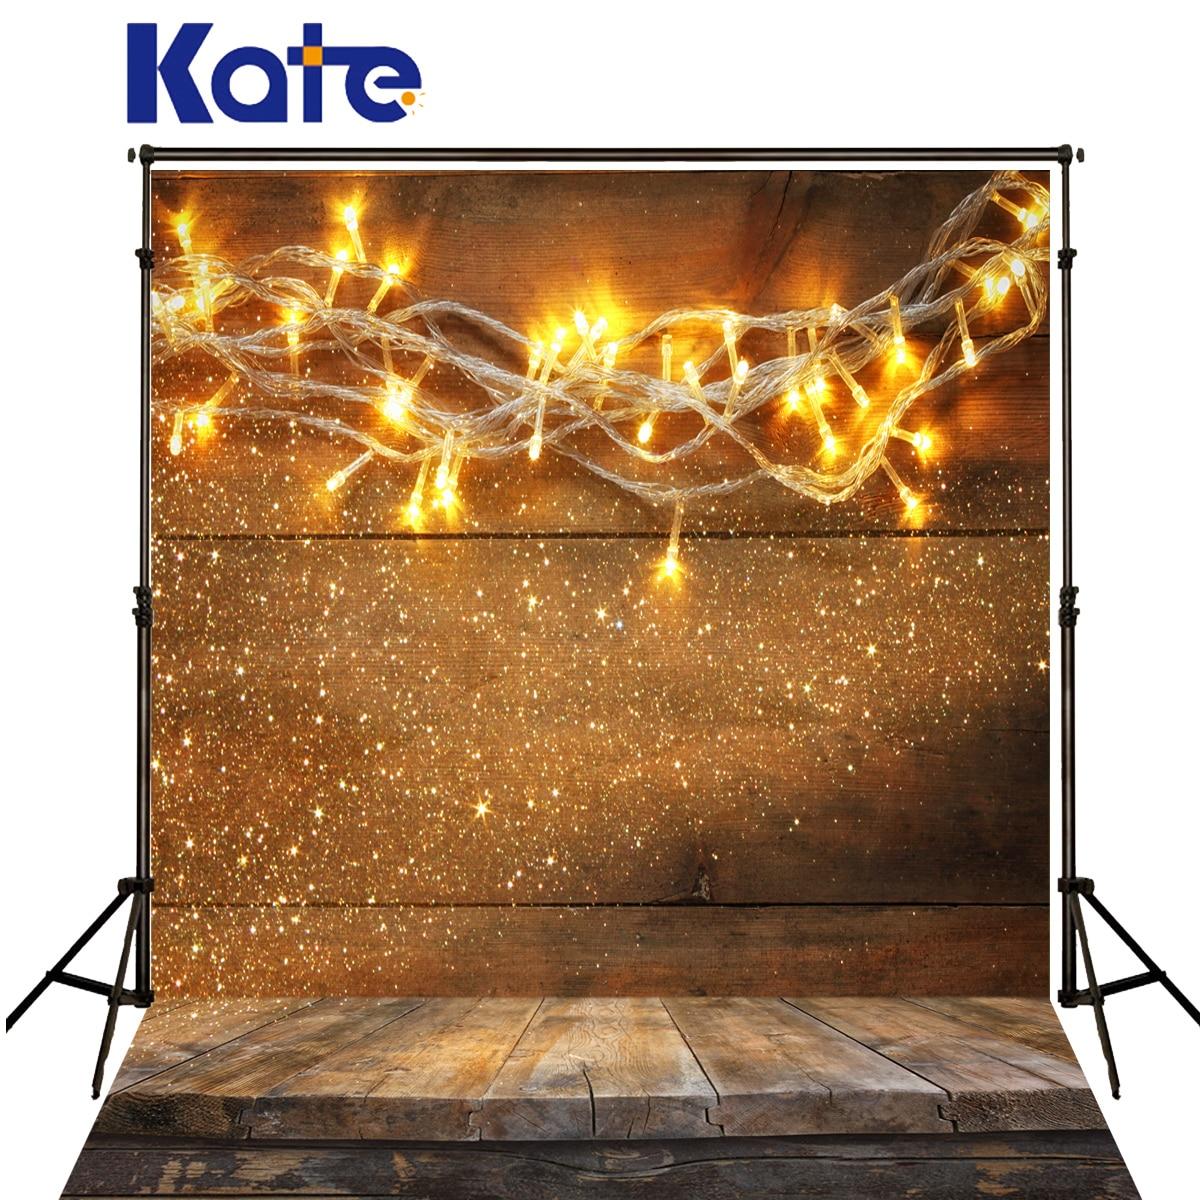 Kate Christmas Backgrounds Photo Colour Lights Spot Fundo Fotografico Madeira Dark Wood Texture Floor Backdrops For Photo Studio<br>